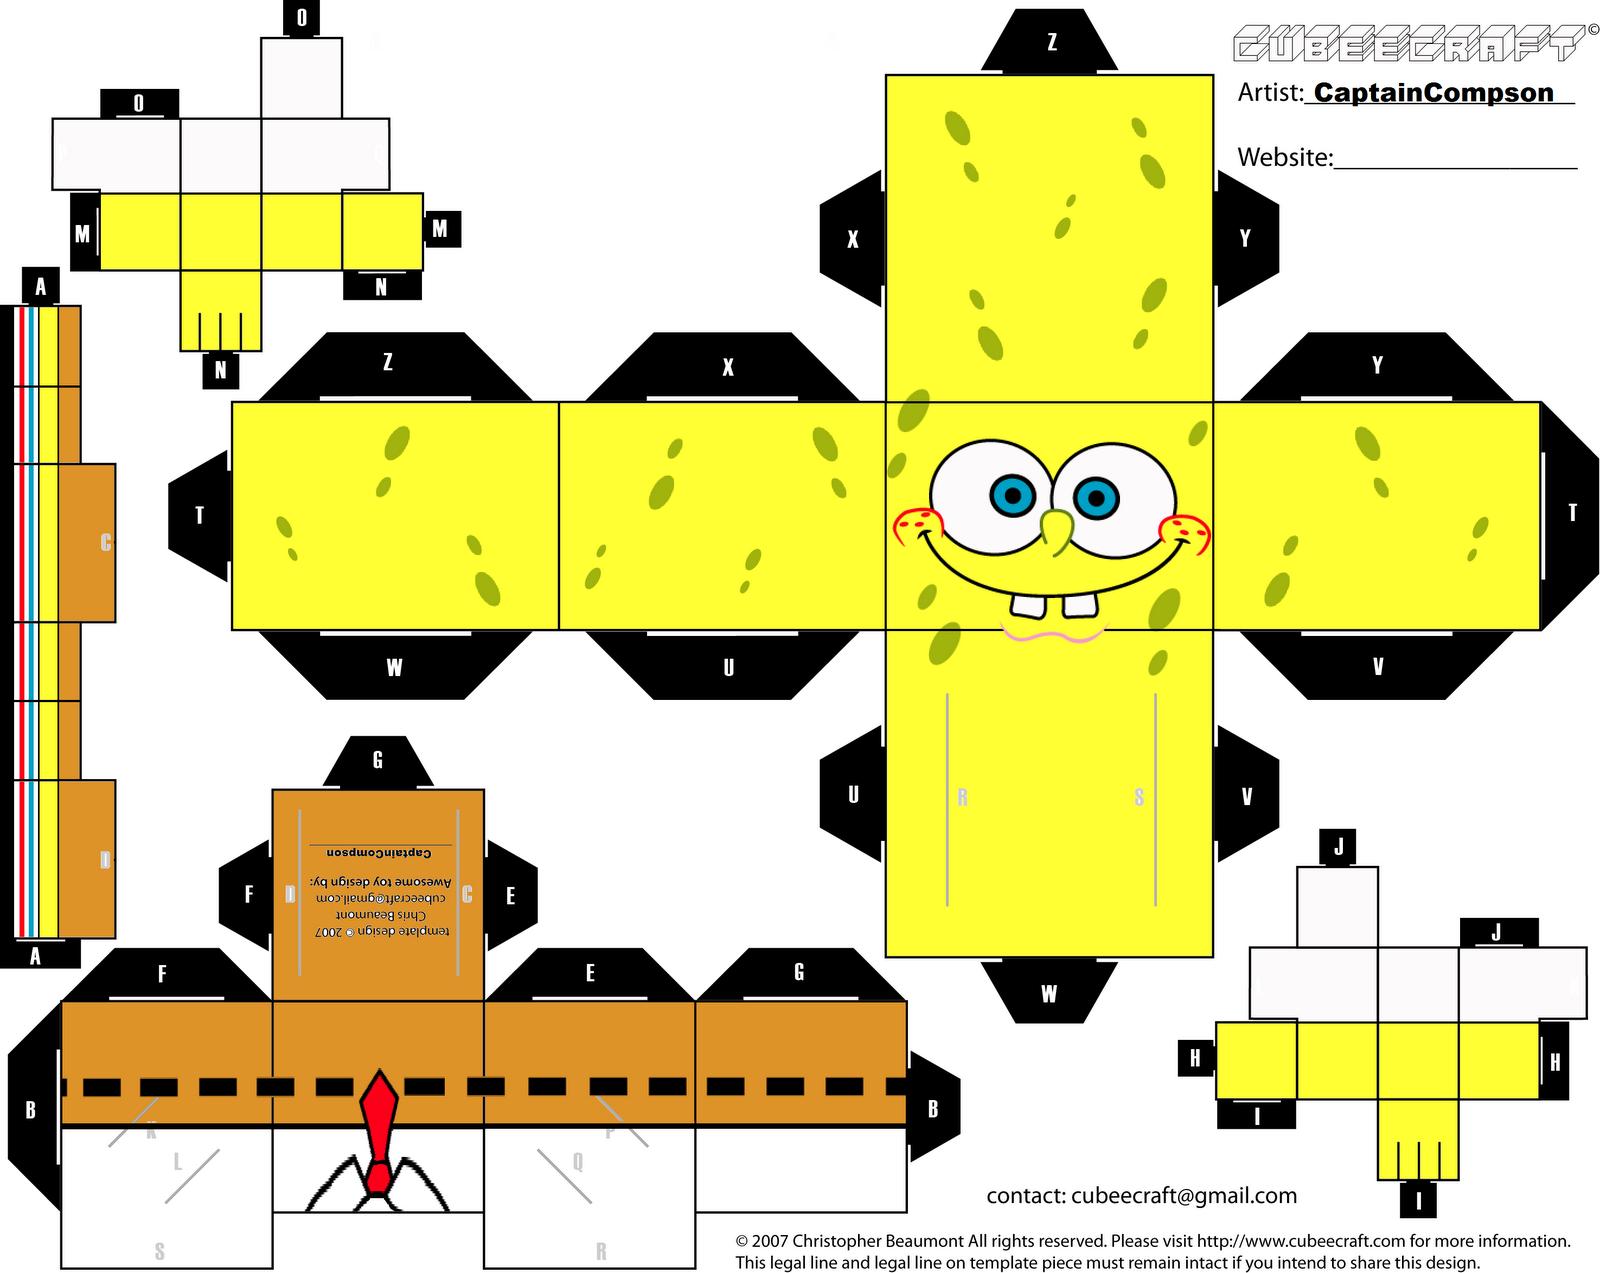 Spongebobcubeecraftbycaptaincompsong printables